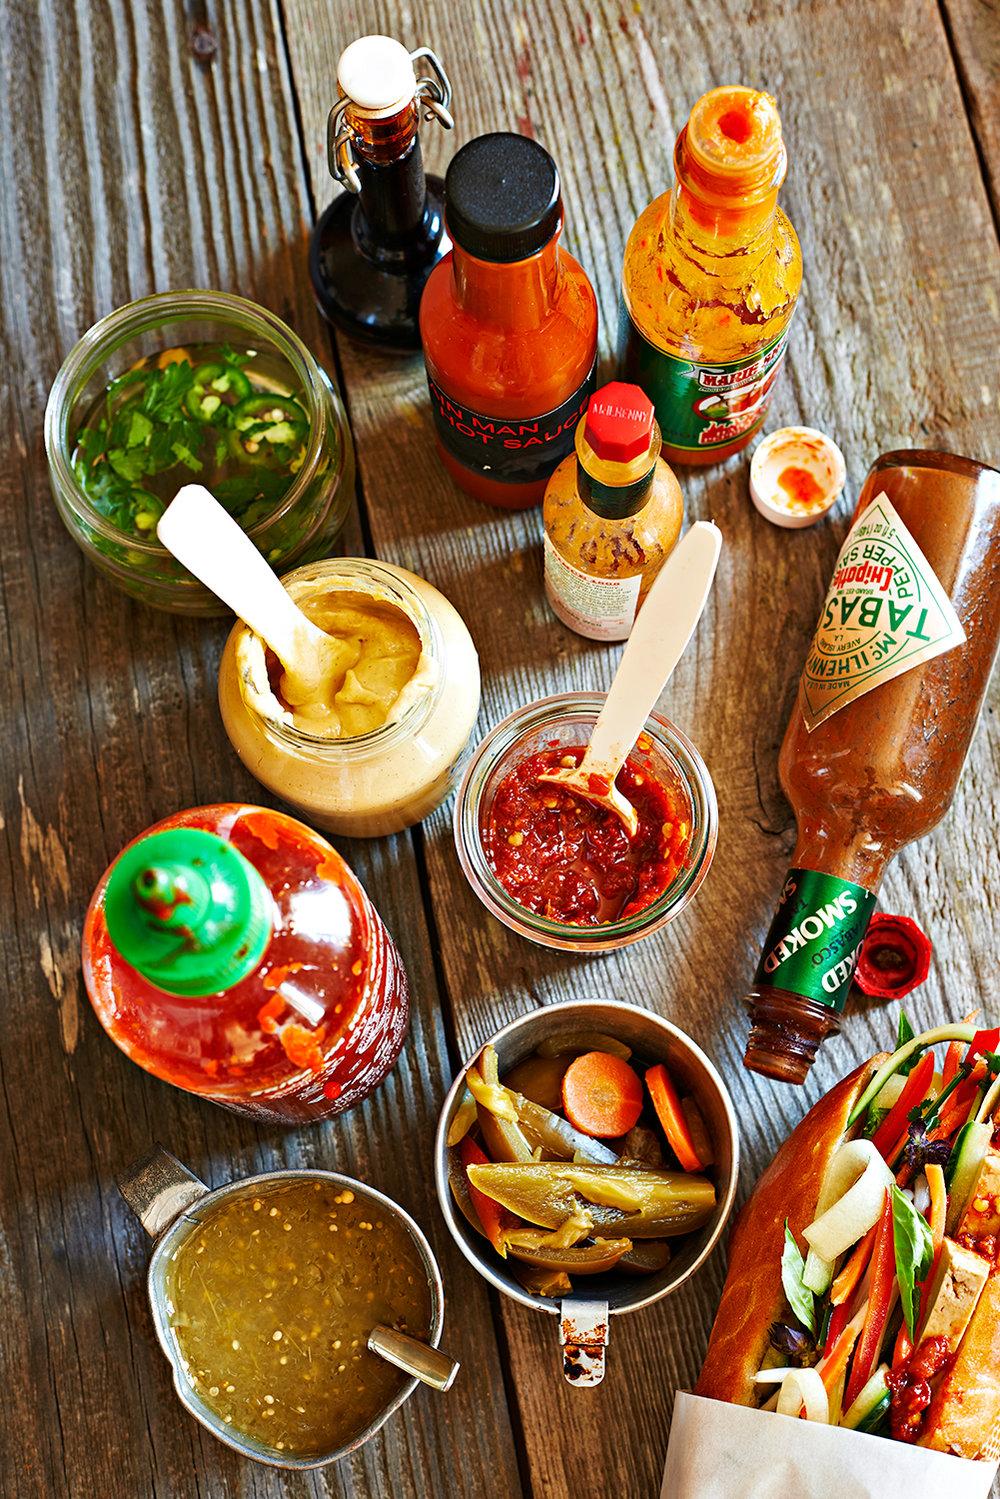 11_Hot-Sauce-Condiment-Table_0114_original.jpg